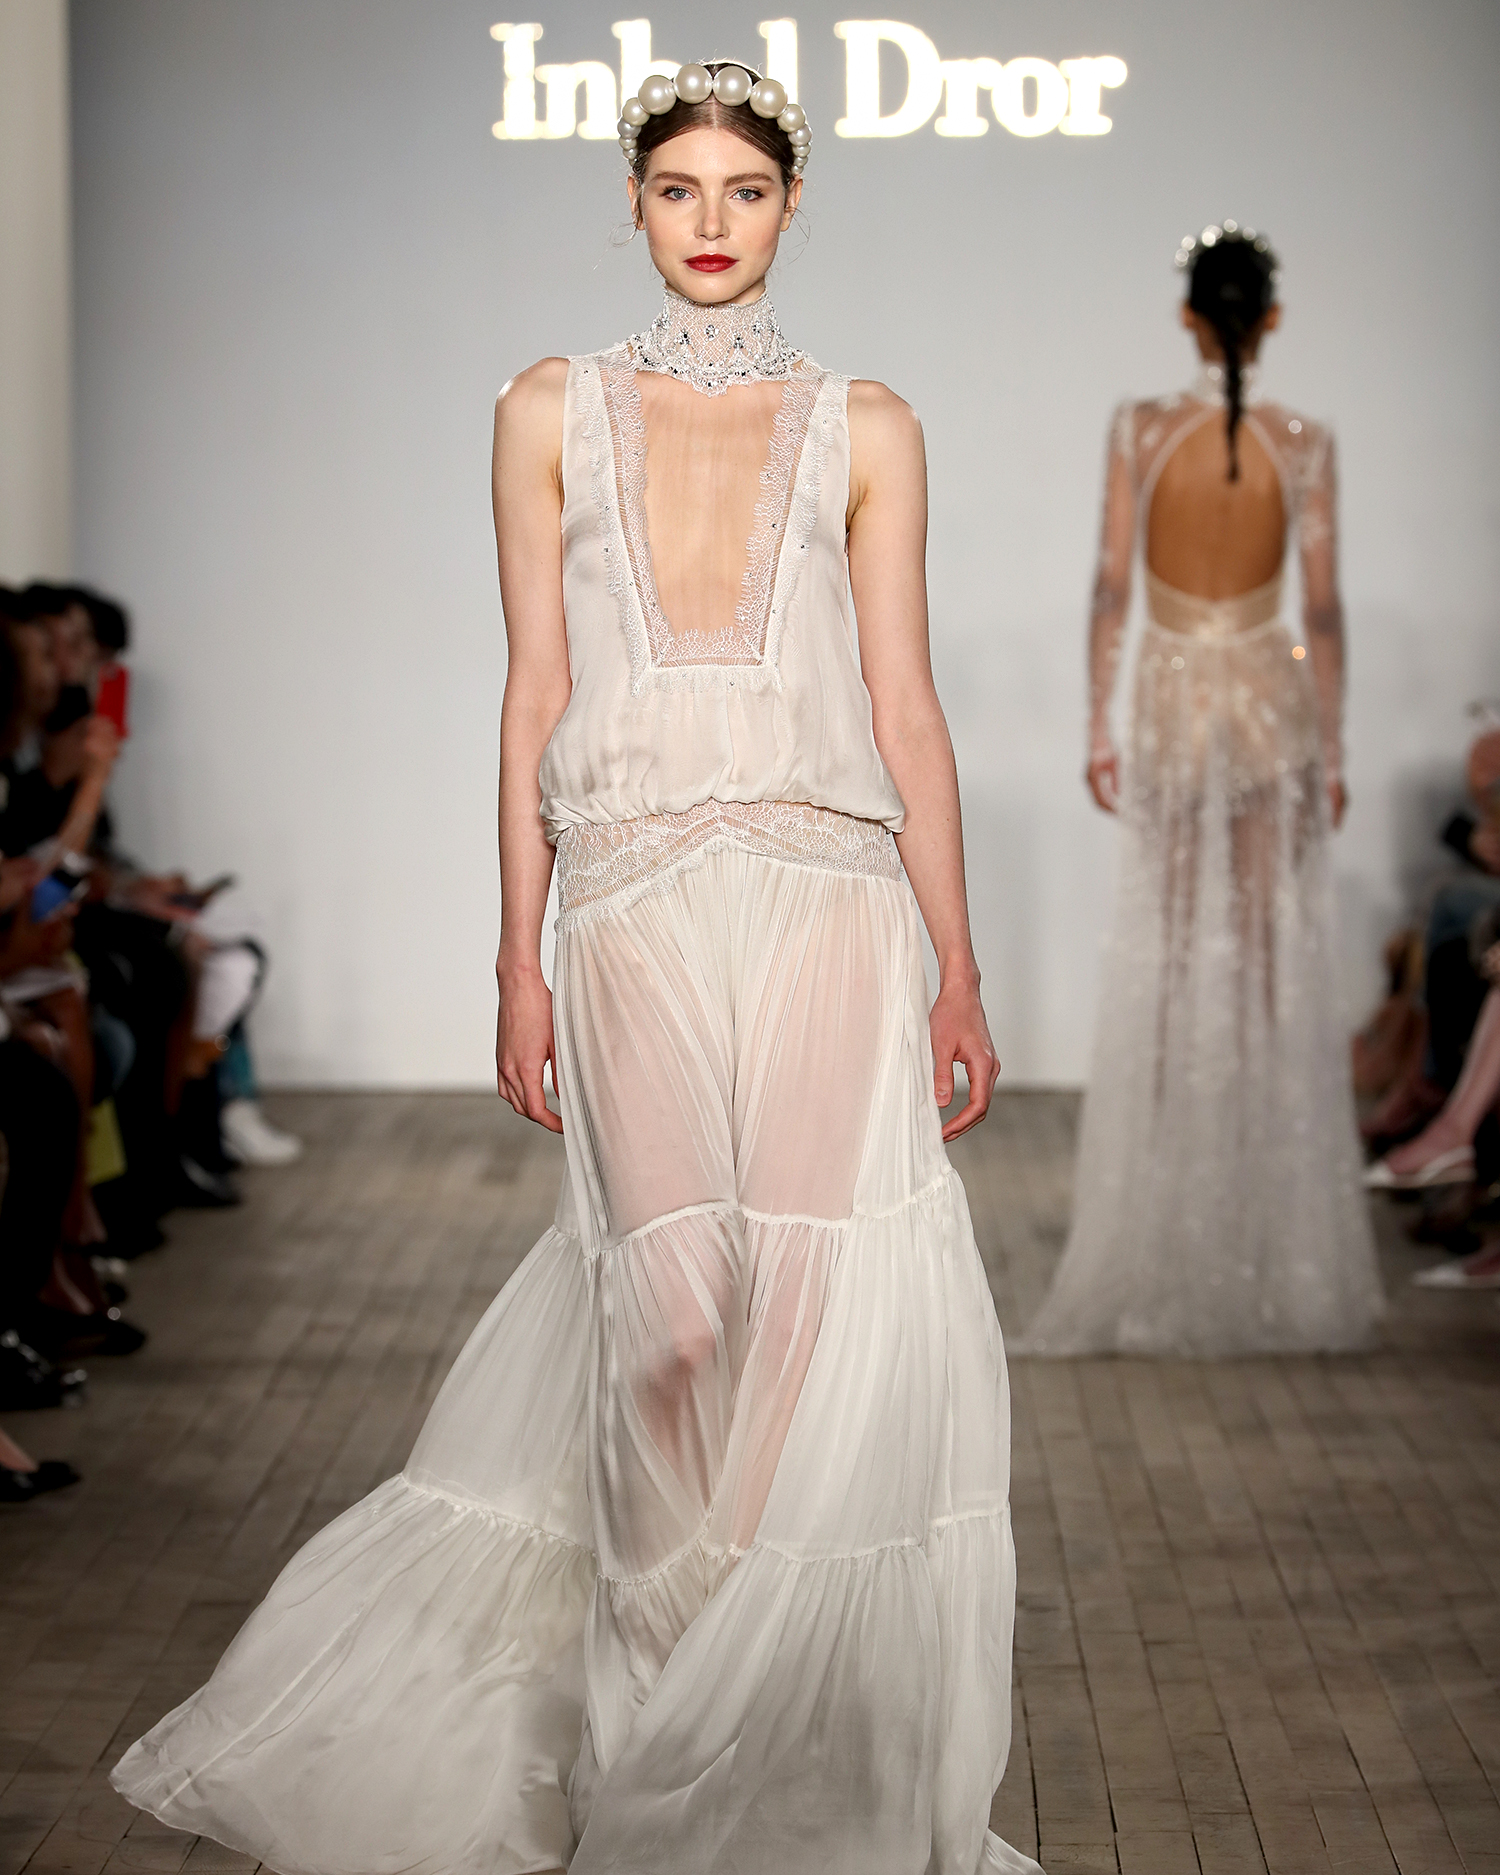 inbal dror wedding dress high illusion neck bloussant bodice